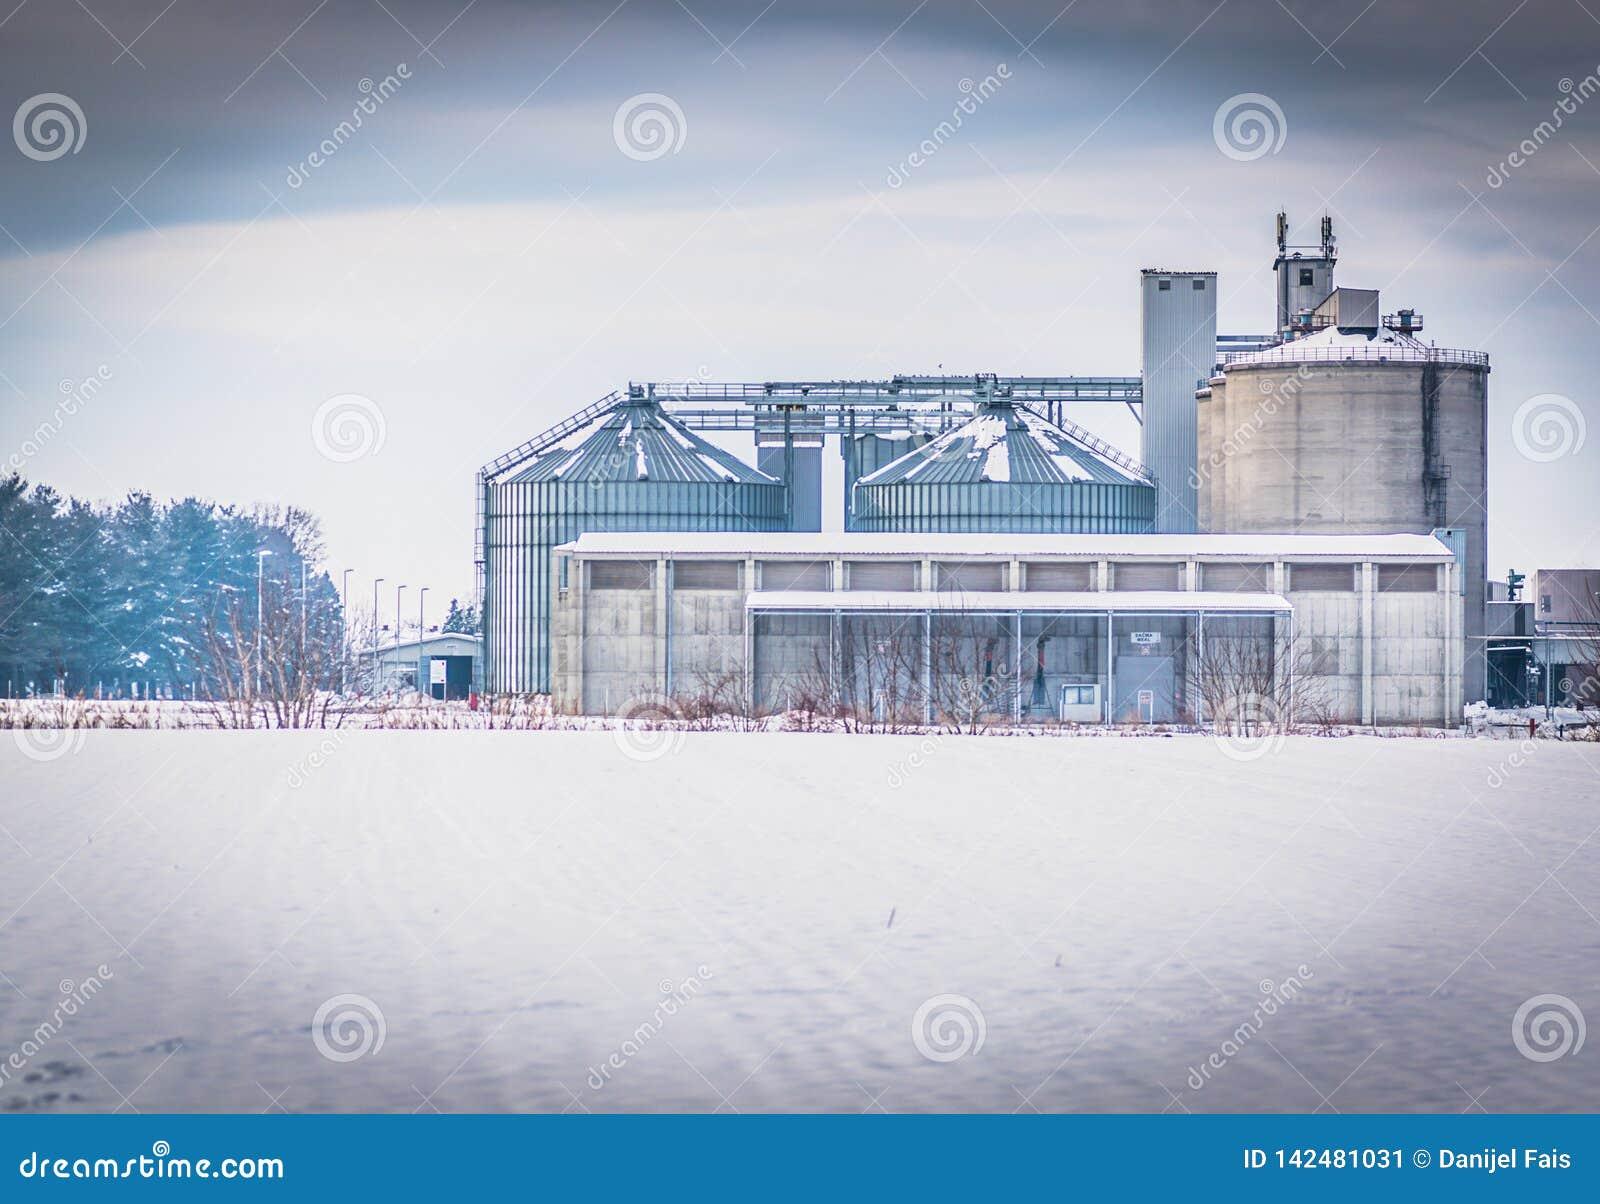 Imagem branca do complexo industy, fábrica do óleo do sunfloer